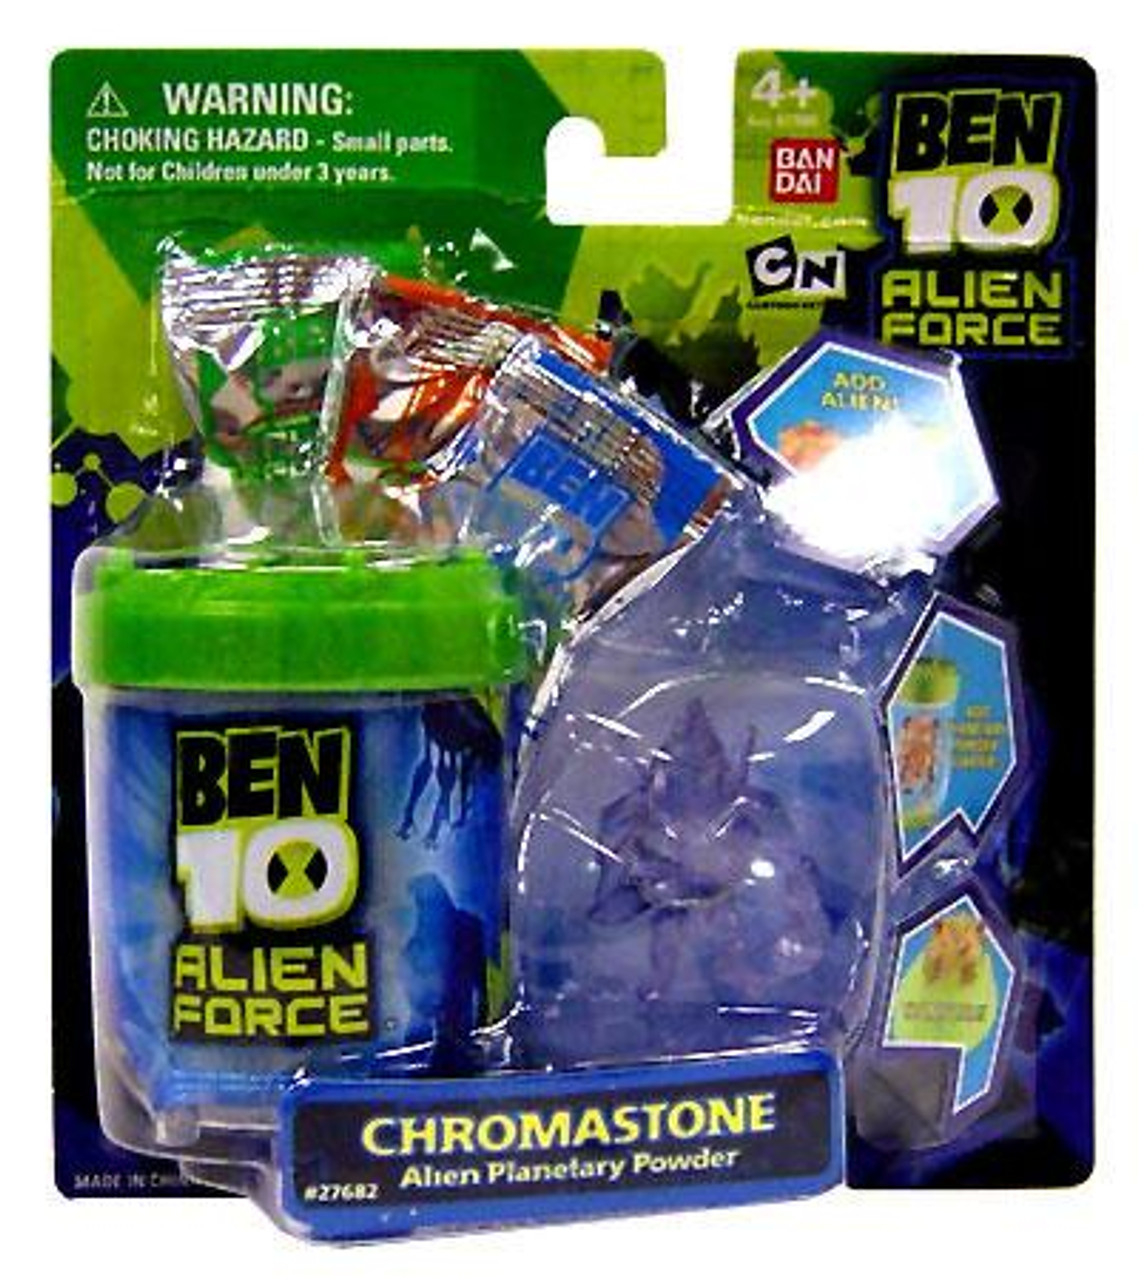 Ben 10 Alien Force Chromastone Planetary Powder Set